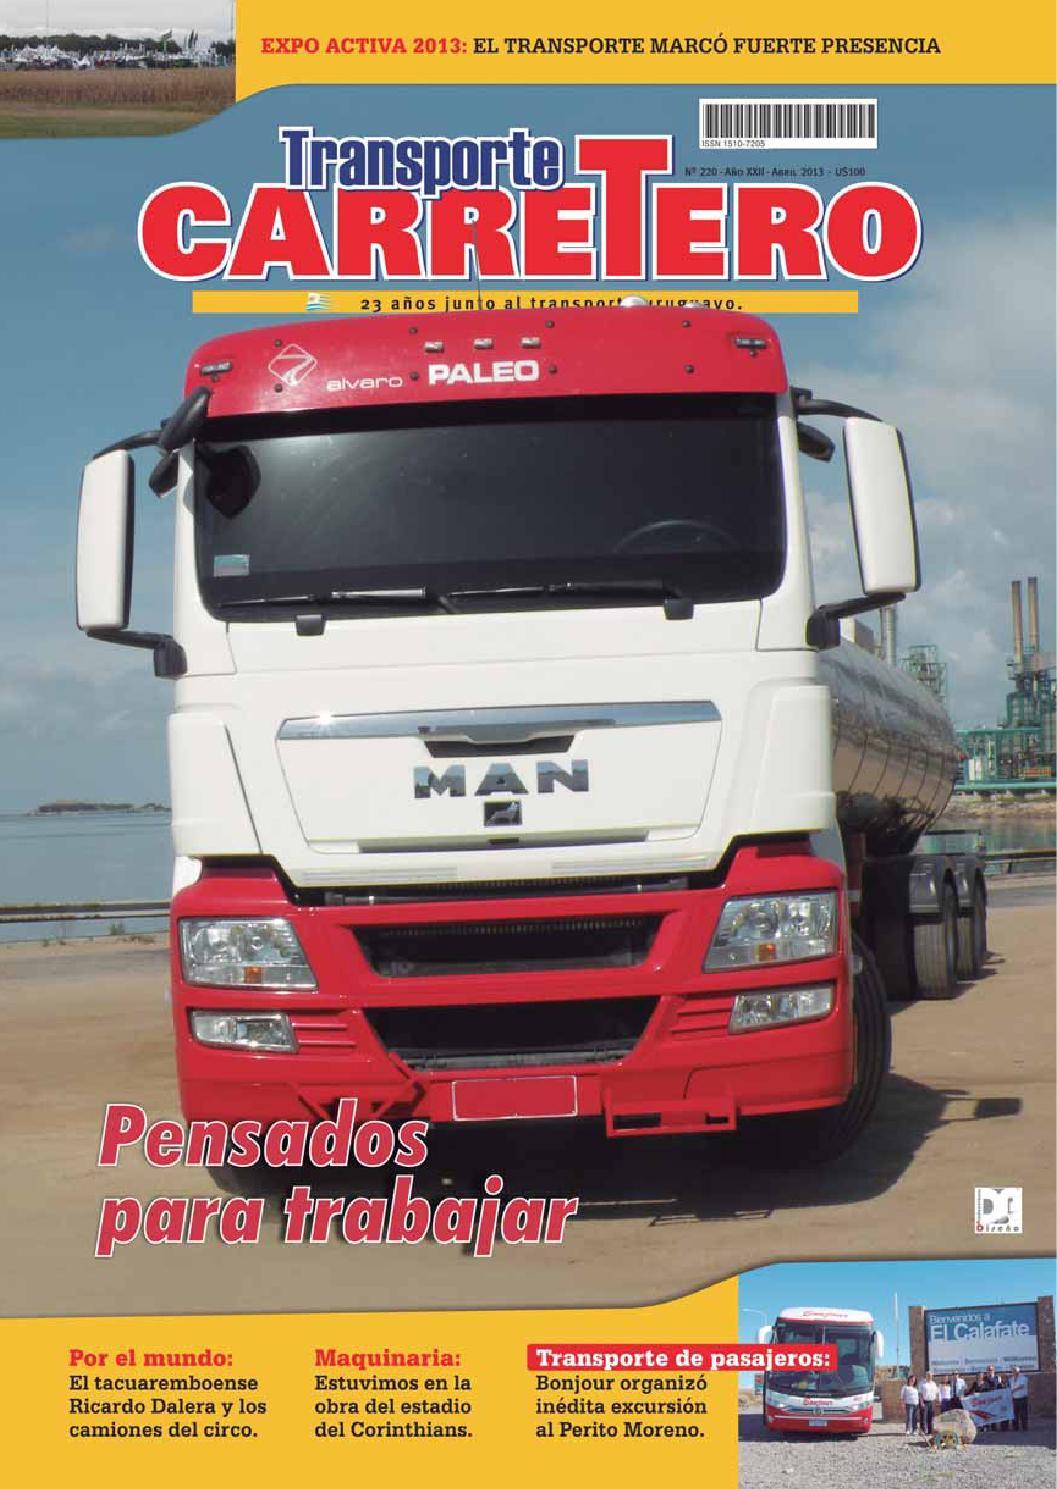 Transporte Carretero Nº 220 - abril 2013 by Diseño Producciones - issuu